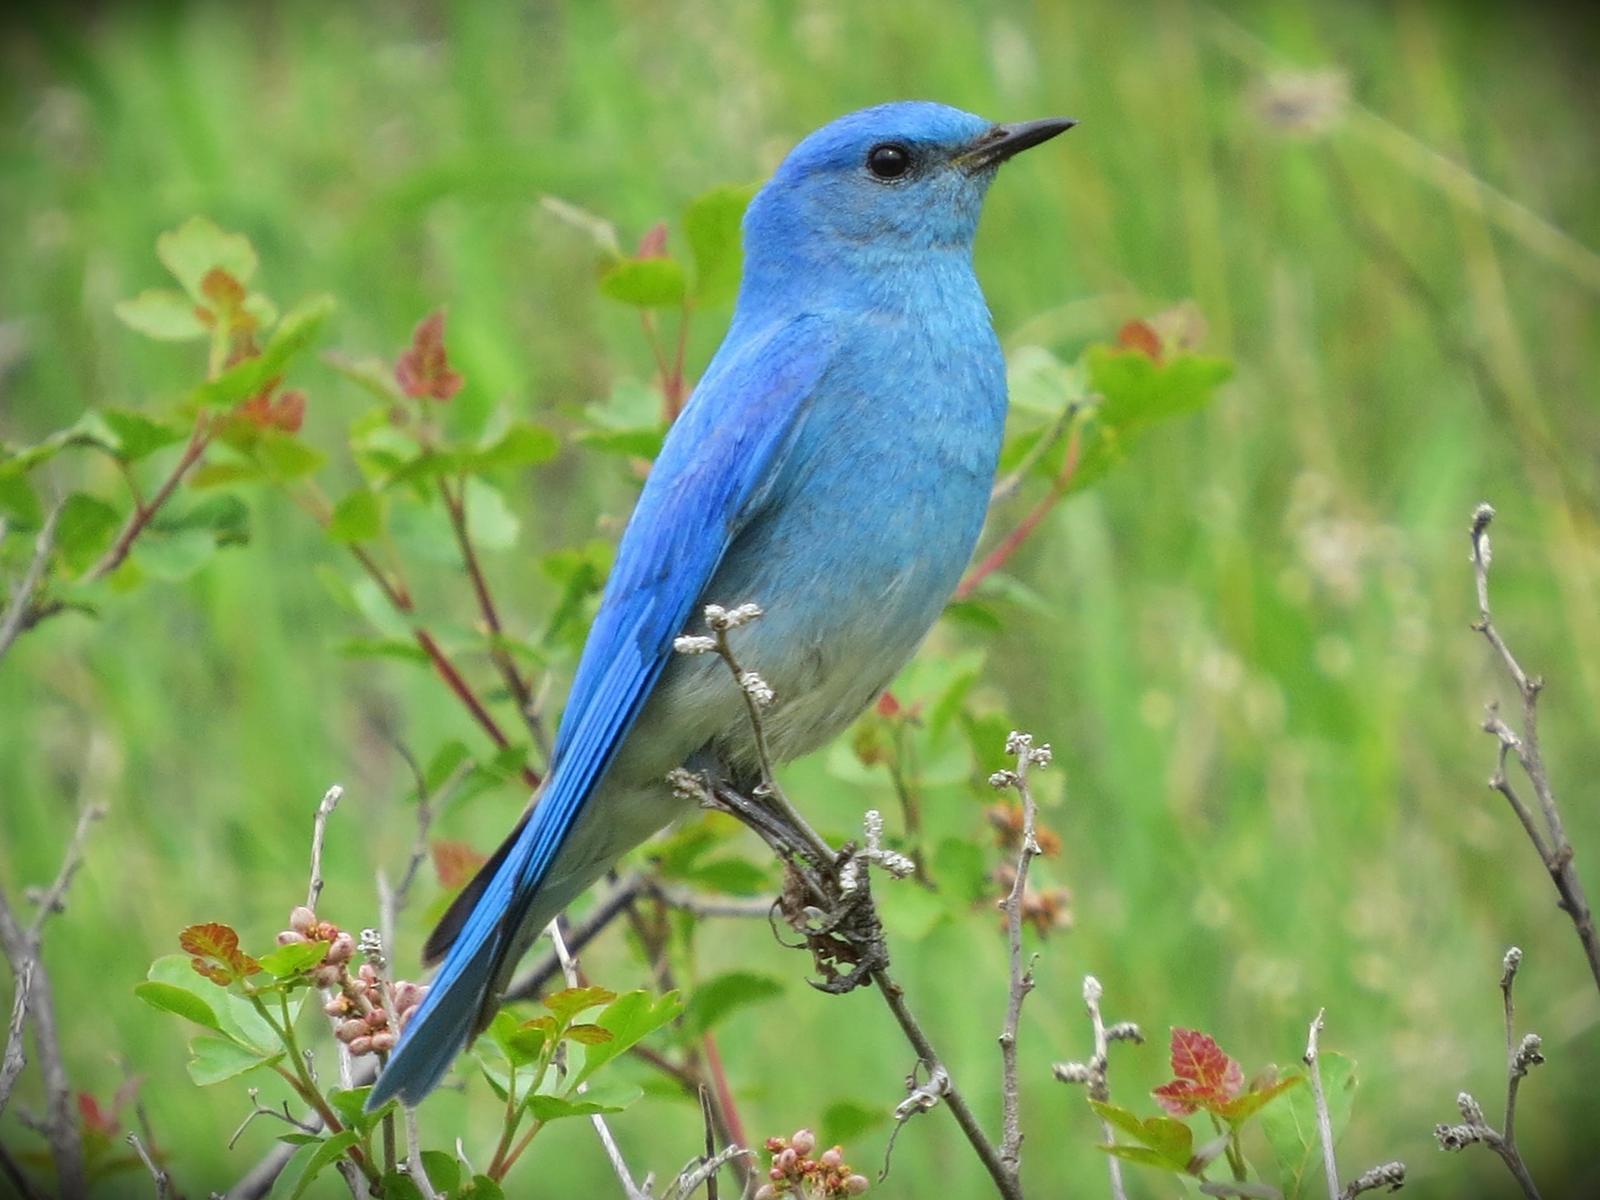 Mountain Bluebird Photo by Bob Neugebauer